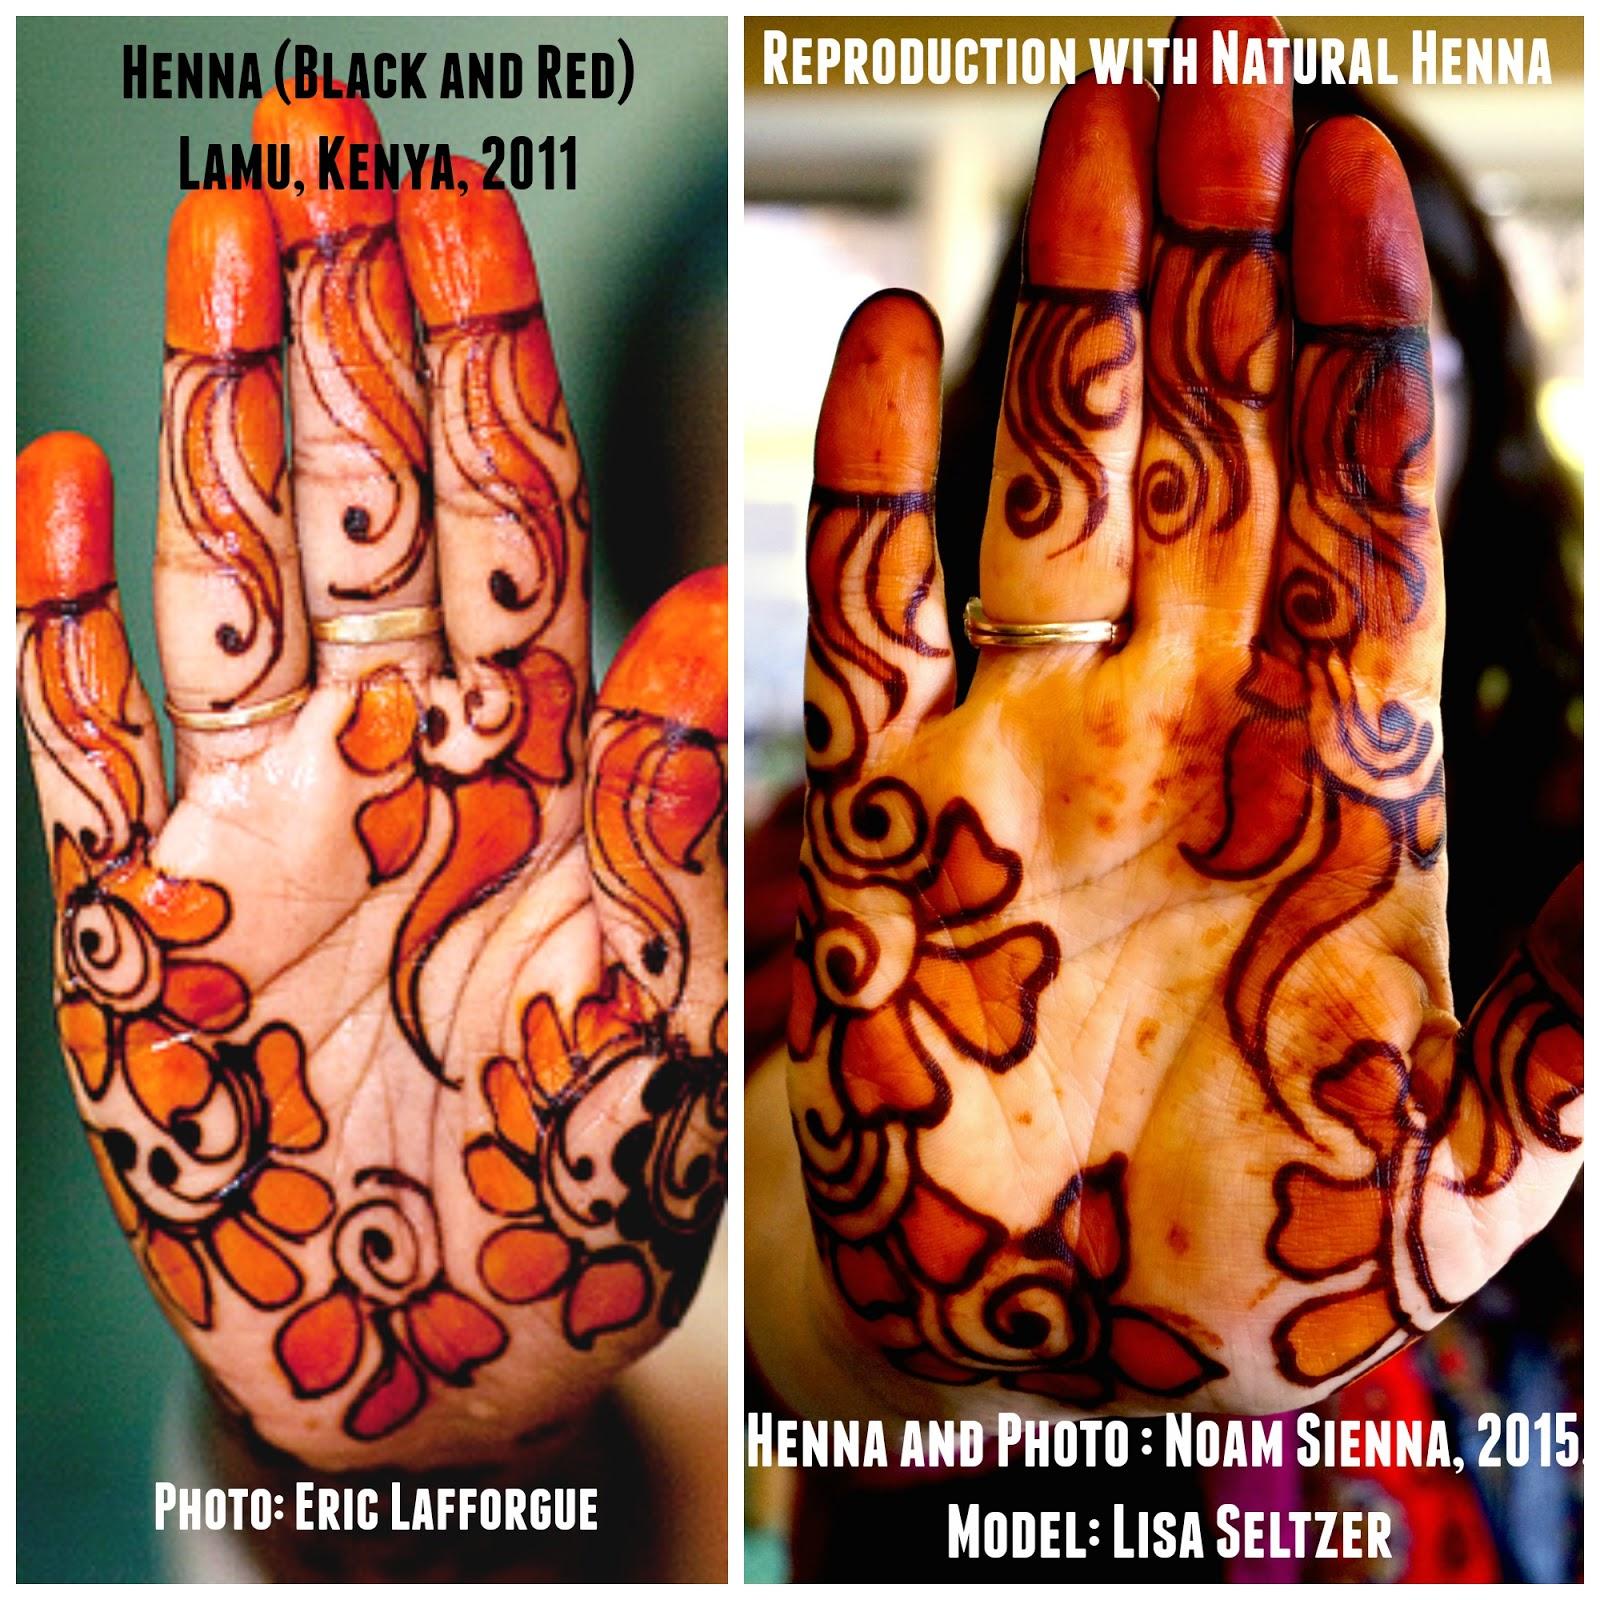 Eshkol HaKofer Cloves And Kohl Henna Traditions On The Swahili